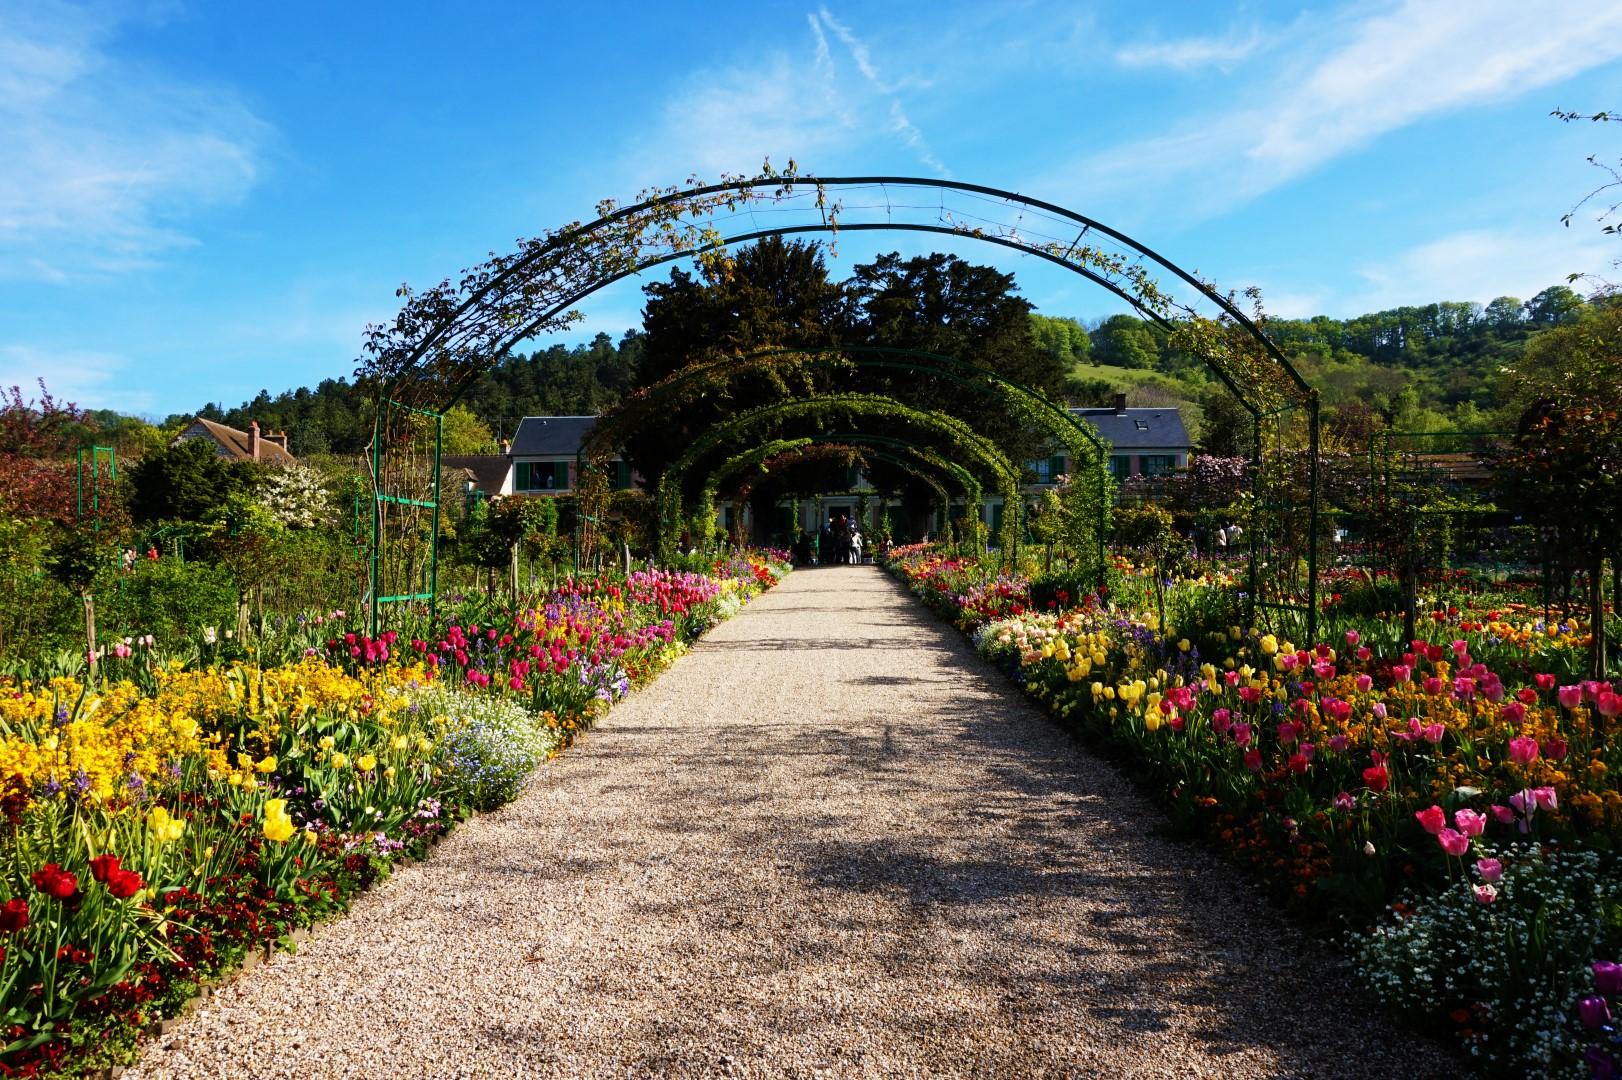 Jardin de Monet - Le Clos Normand